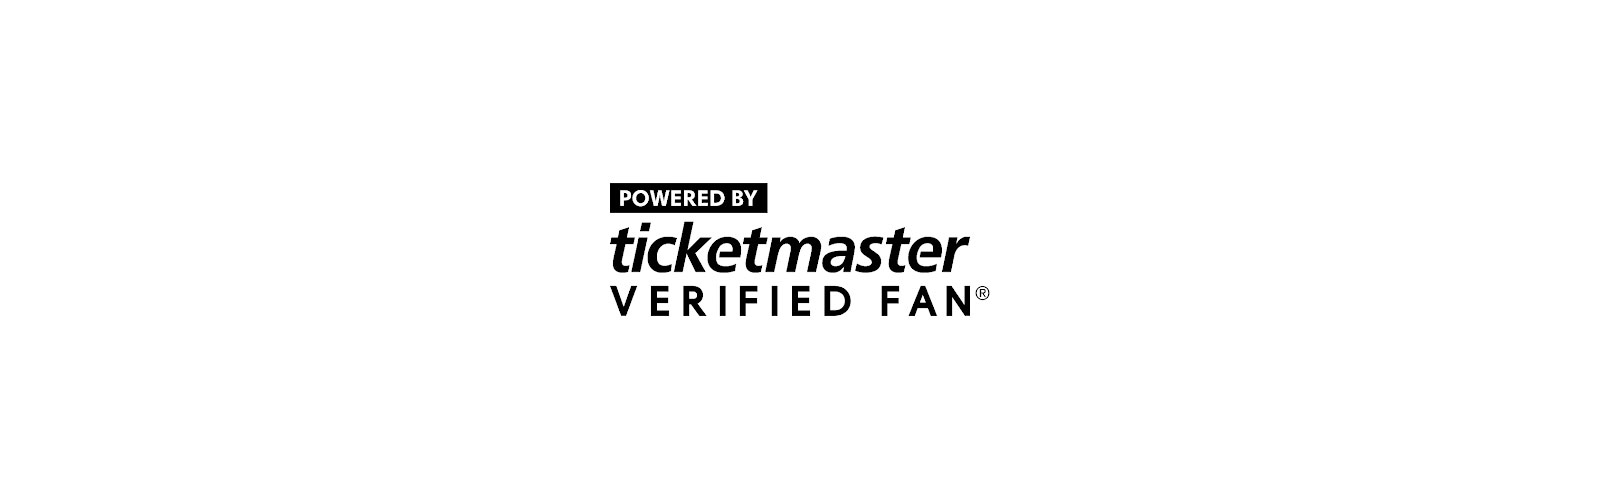 verifed-fan-ticketmaster